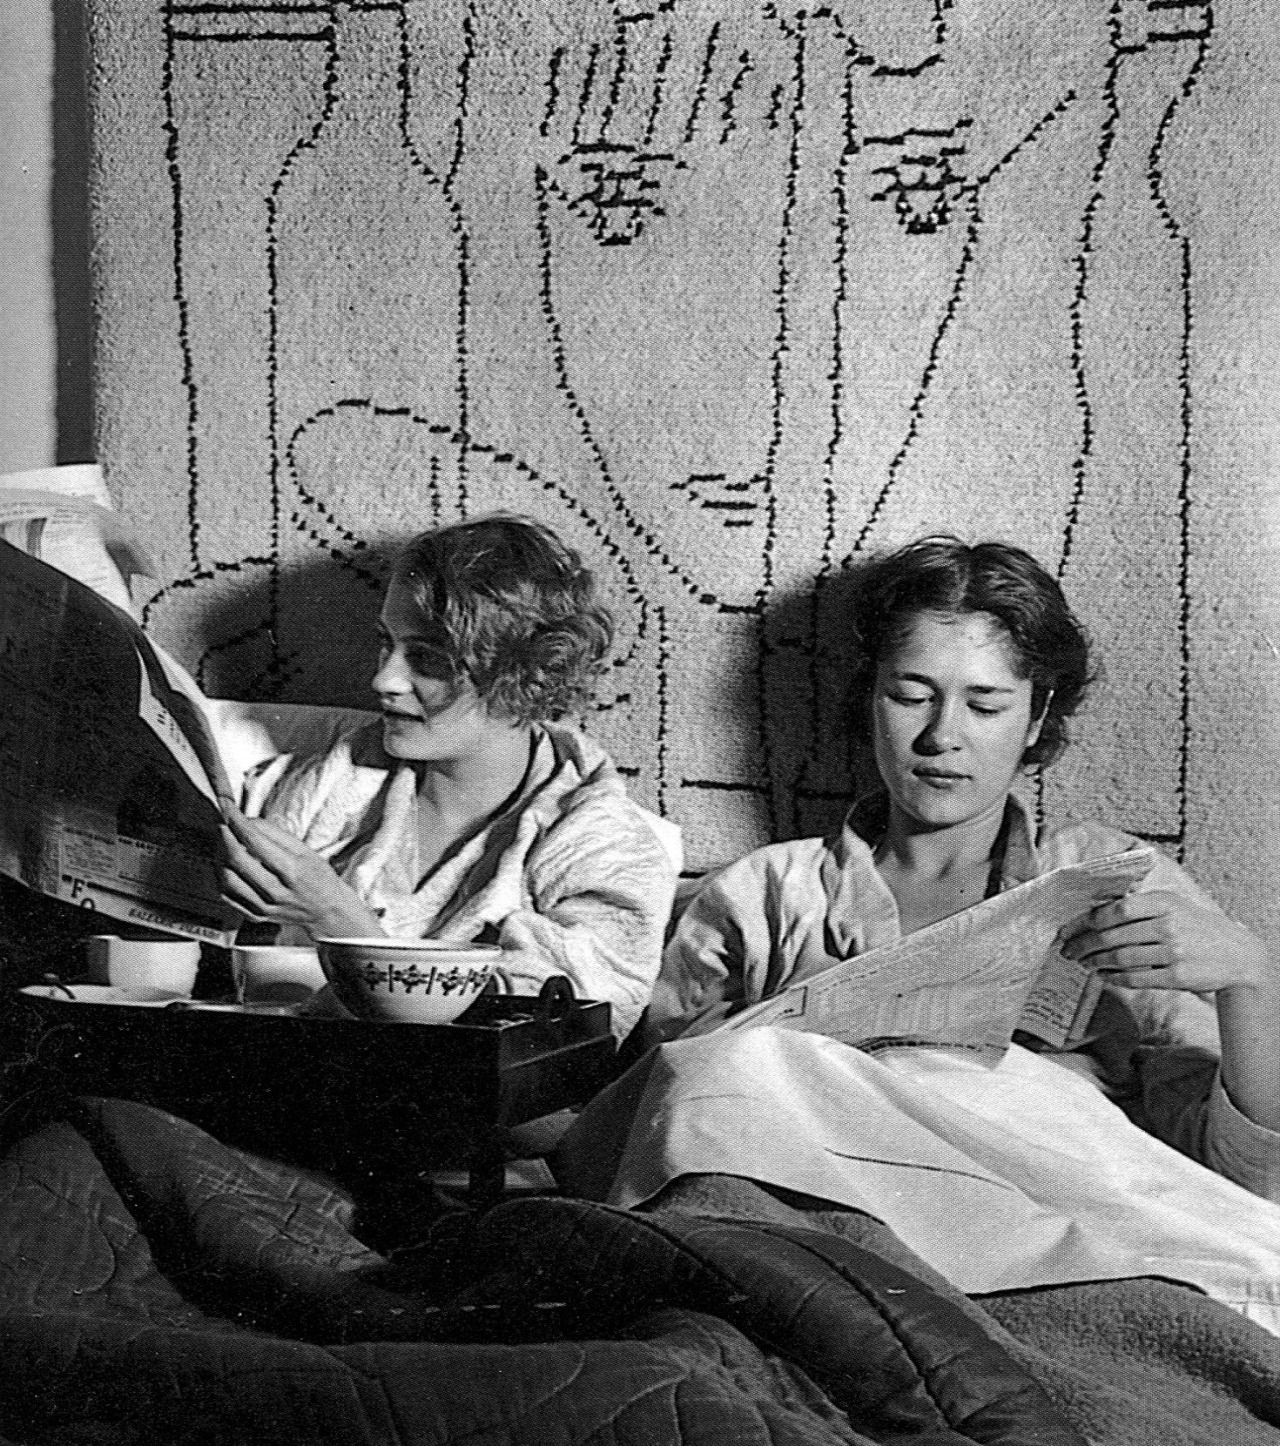 Lee Miller and Tanja Ramm having breakfast in bed at Lee's Paris studio, Theodore Miller